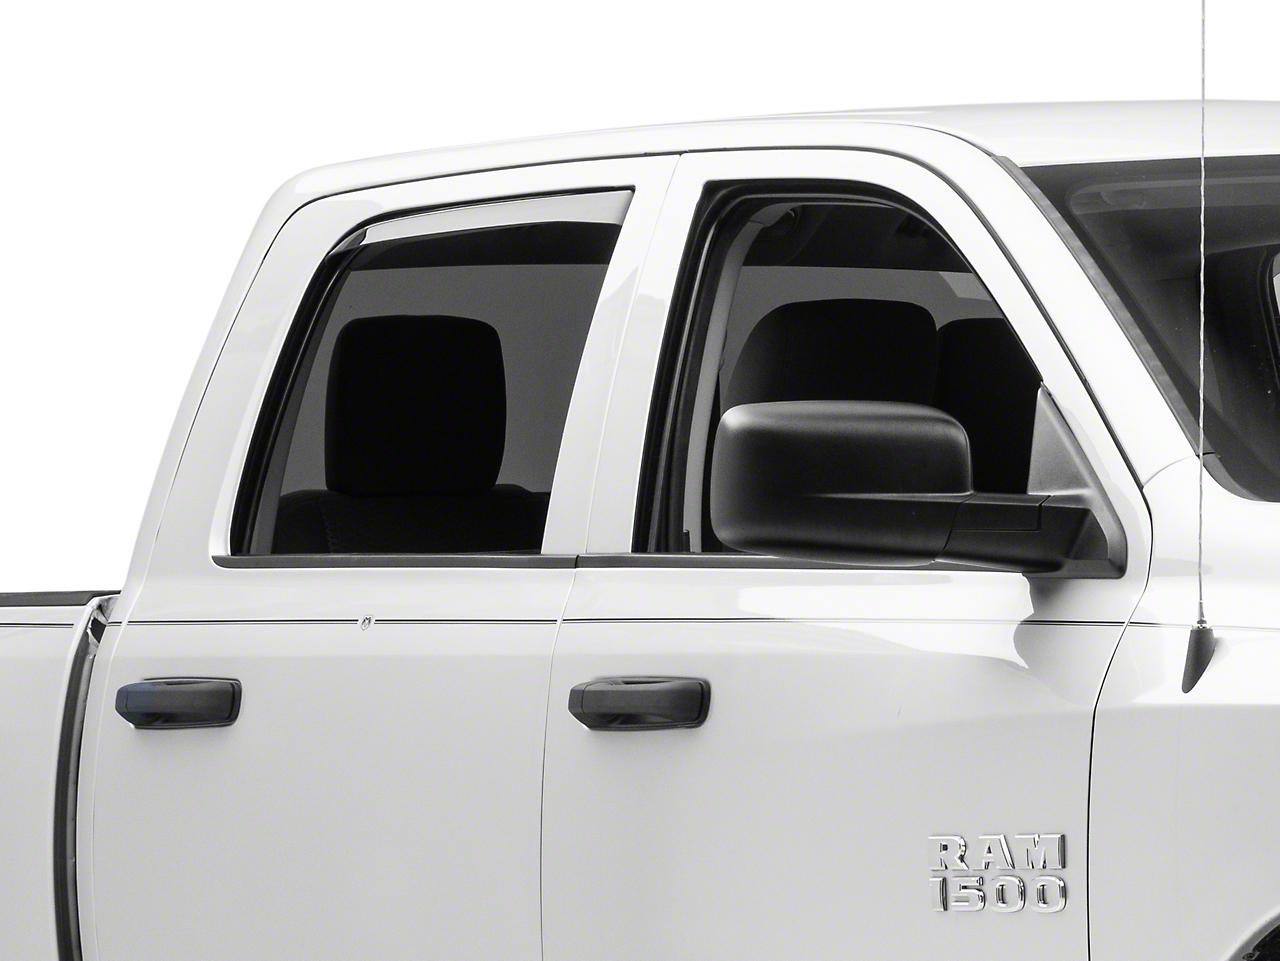 Weathertech Rear Side Window Deflectors - Light Smoke (09-18 RAM 1500 Quad Cab, Crew Cab)